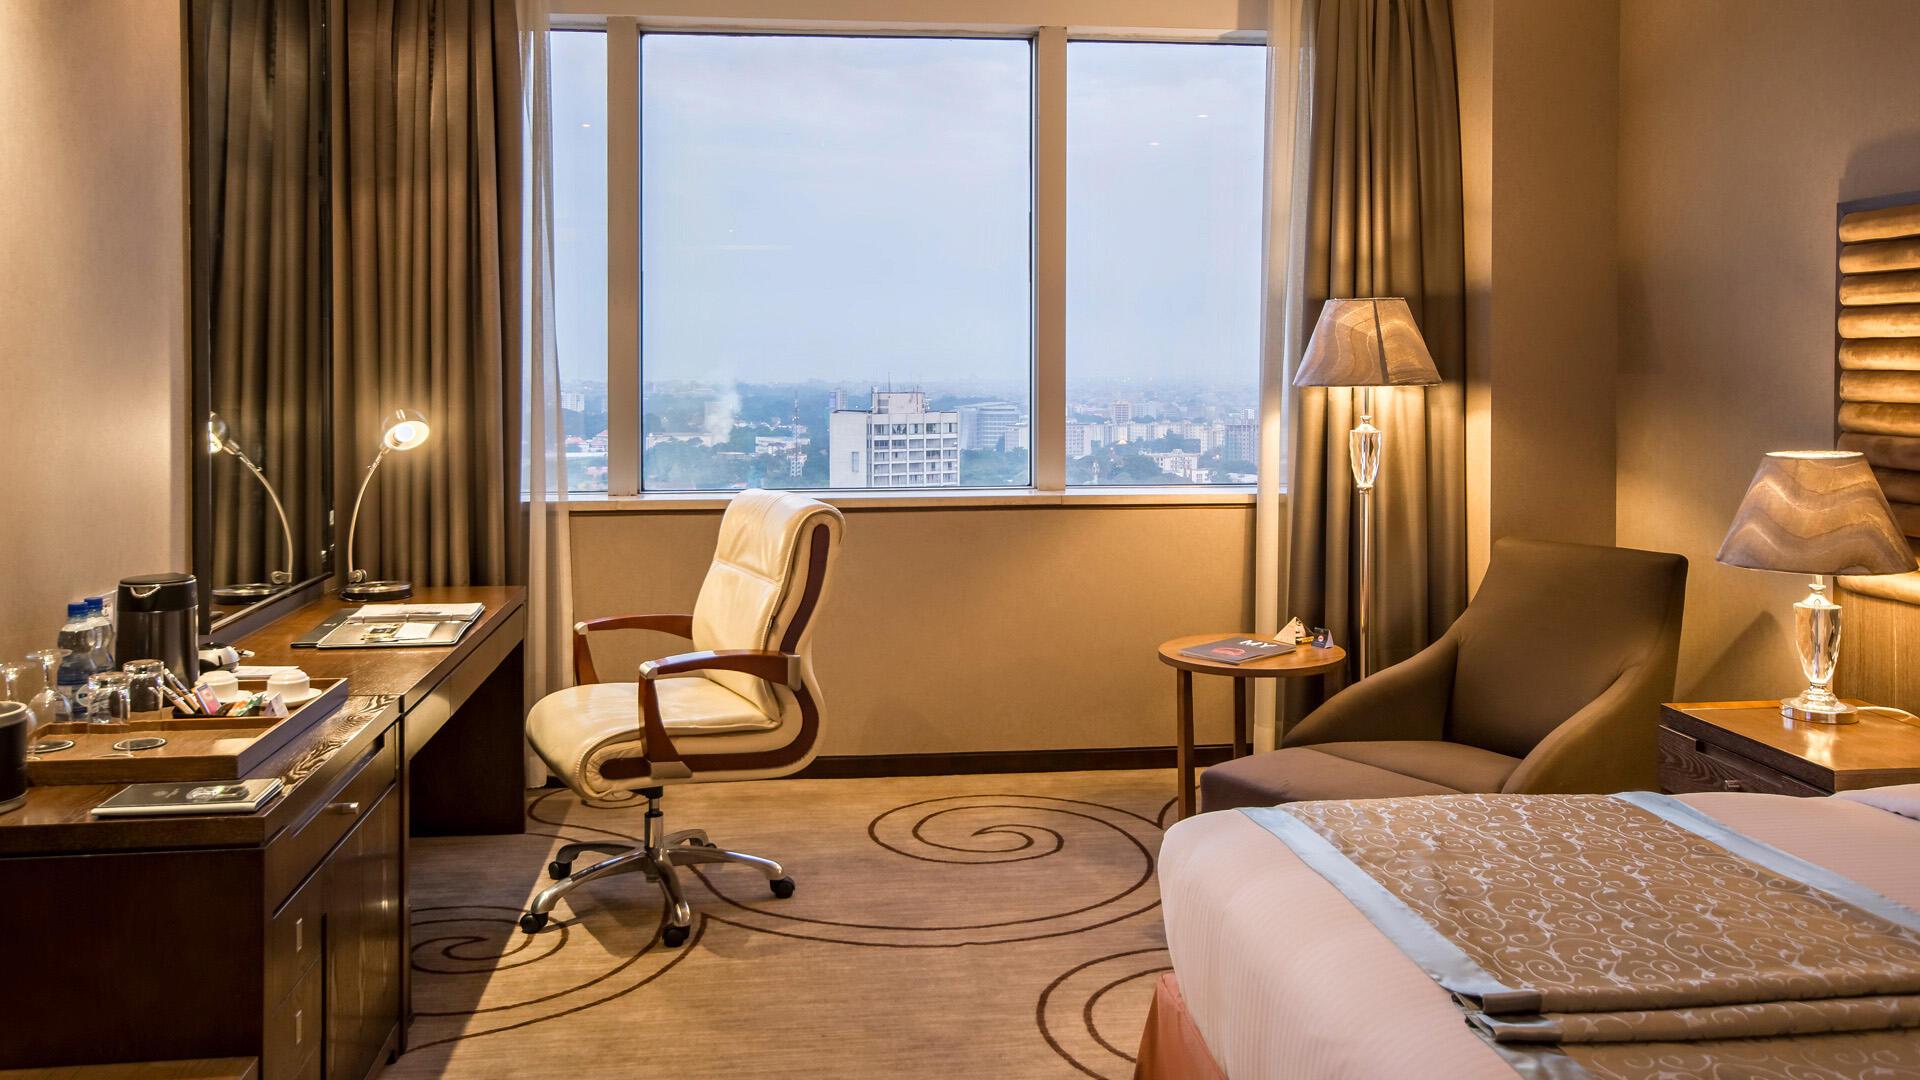 Deluxe Room at Fleuve Congo Hotel Hotel in Kinshasa